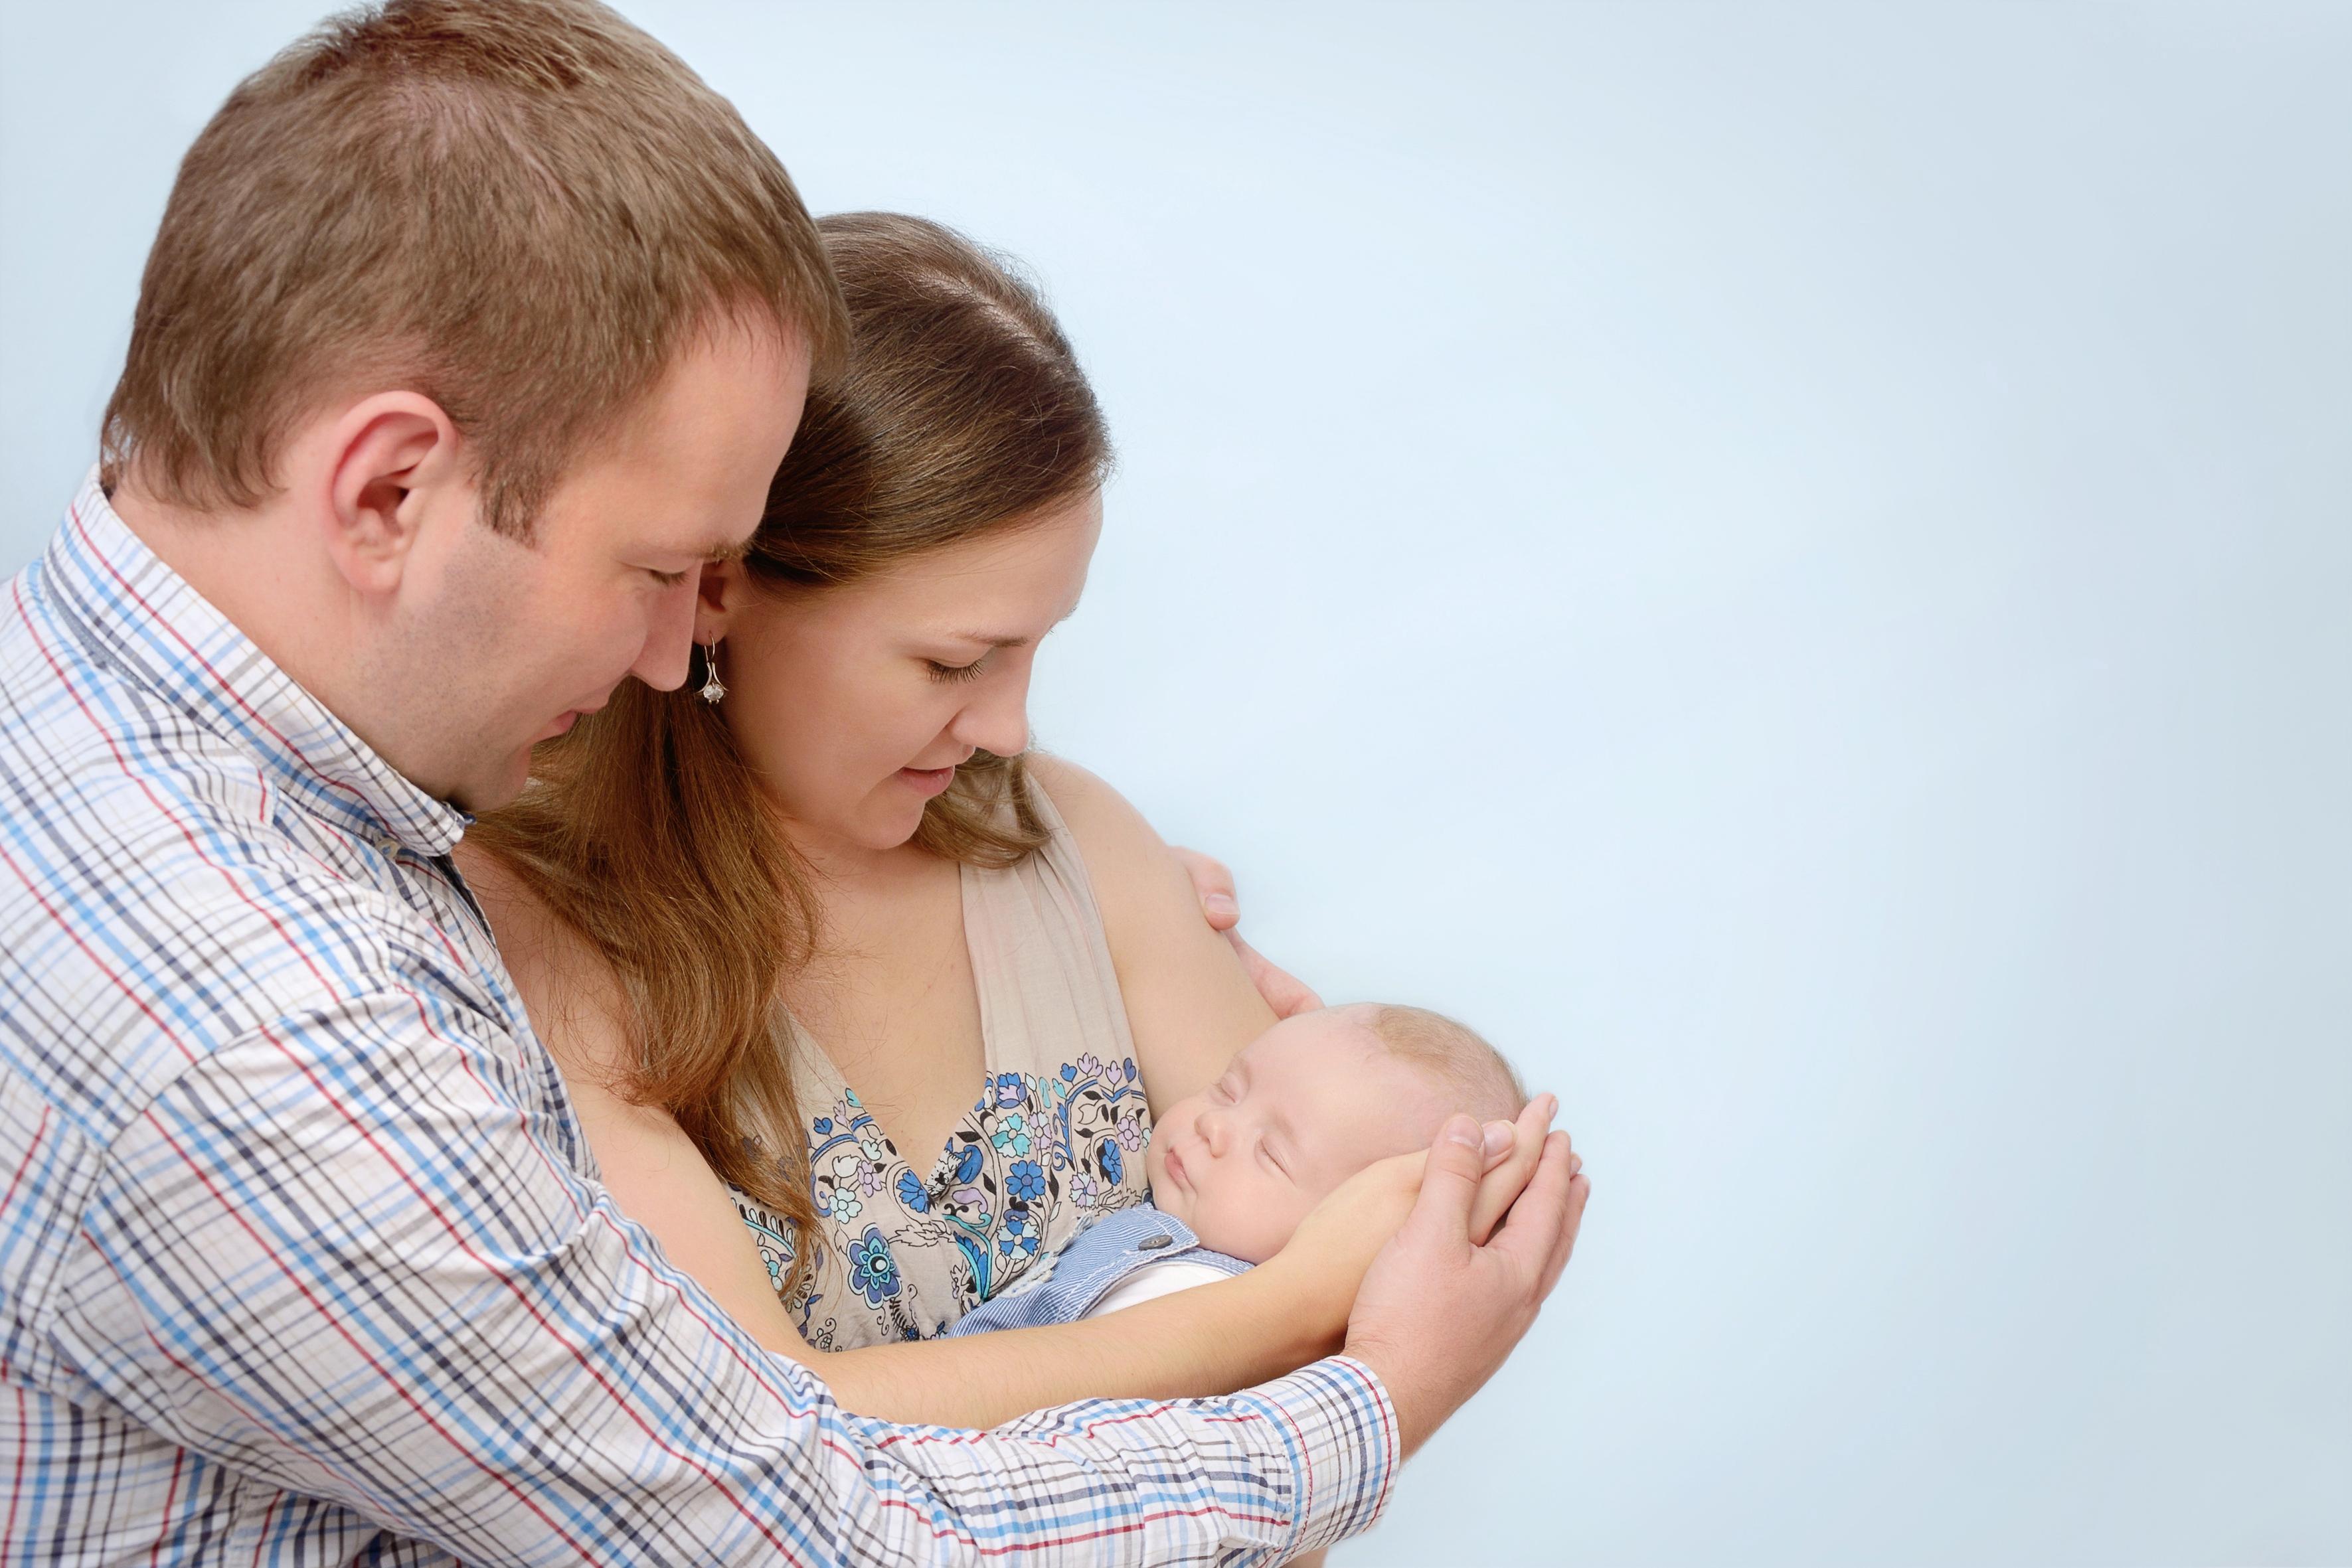 Proud parents cradling their newborn baby.